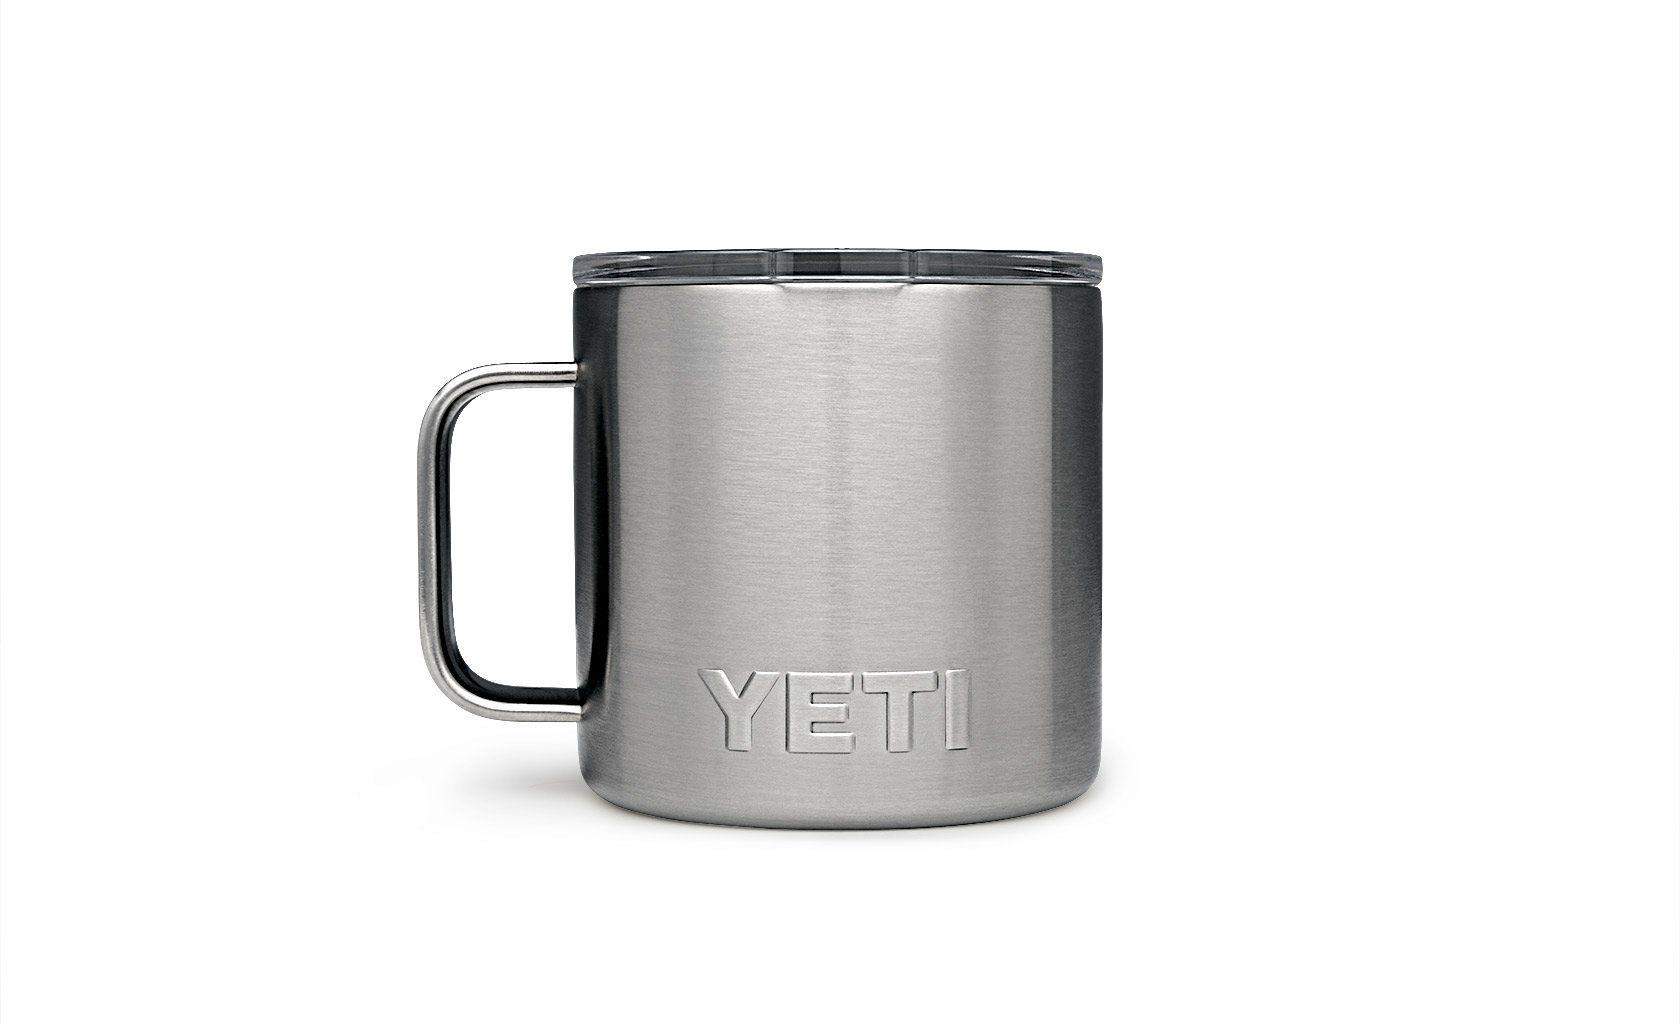 23+ Yeti insulated coffee mug with handle ideas